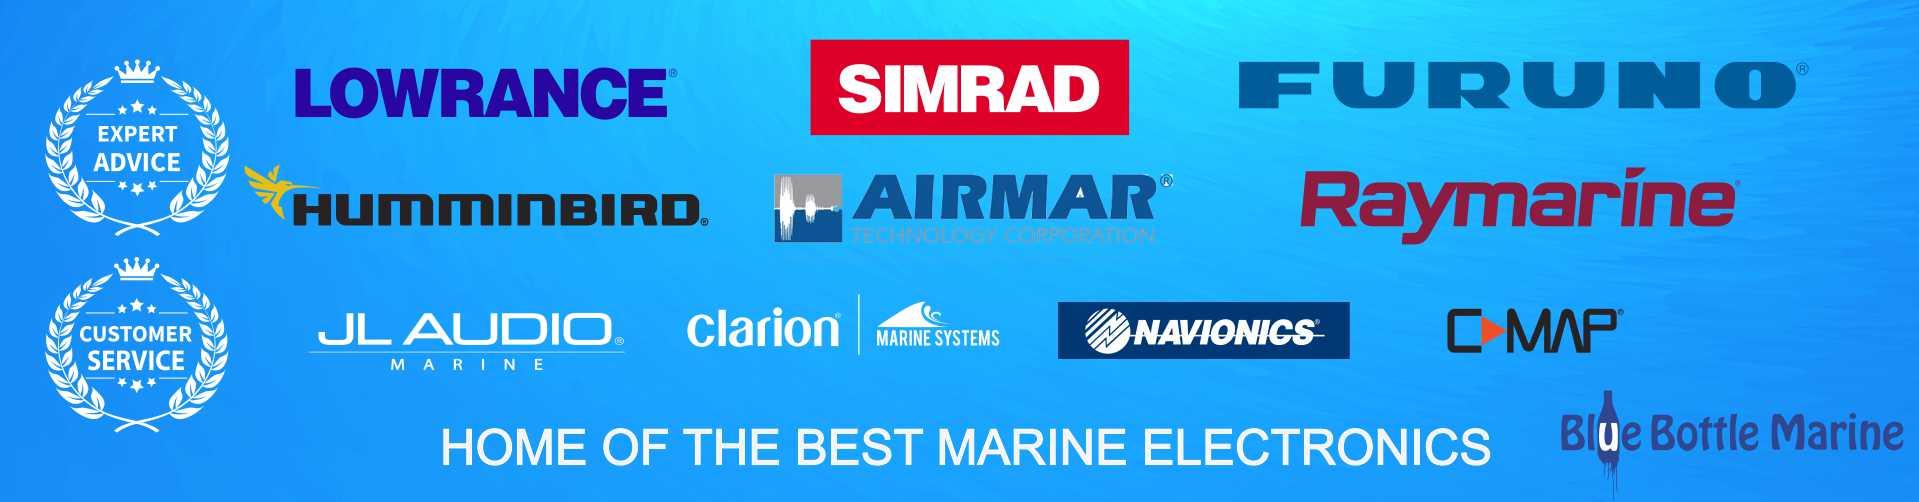 bbm-marine-electonics-home-web-slider.jpg